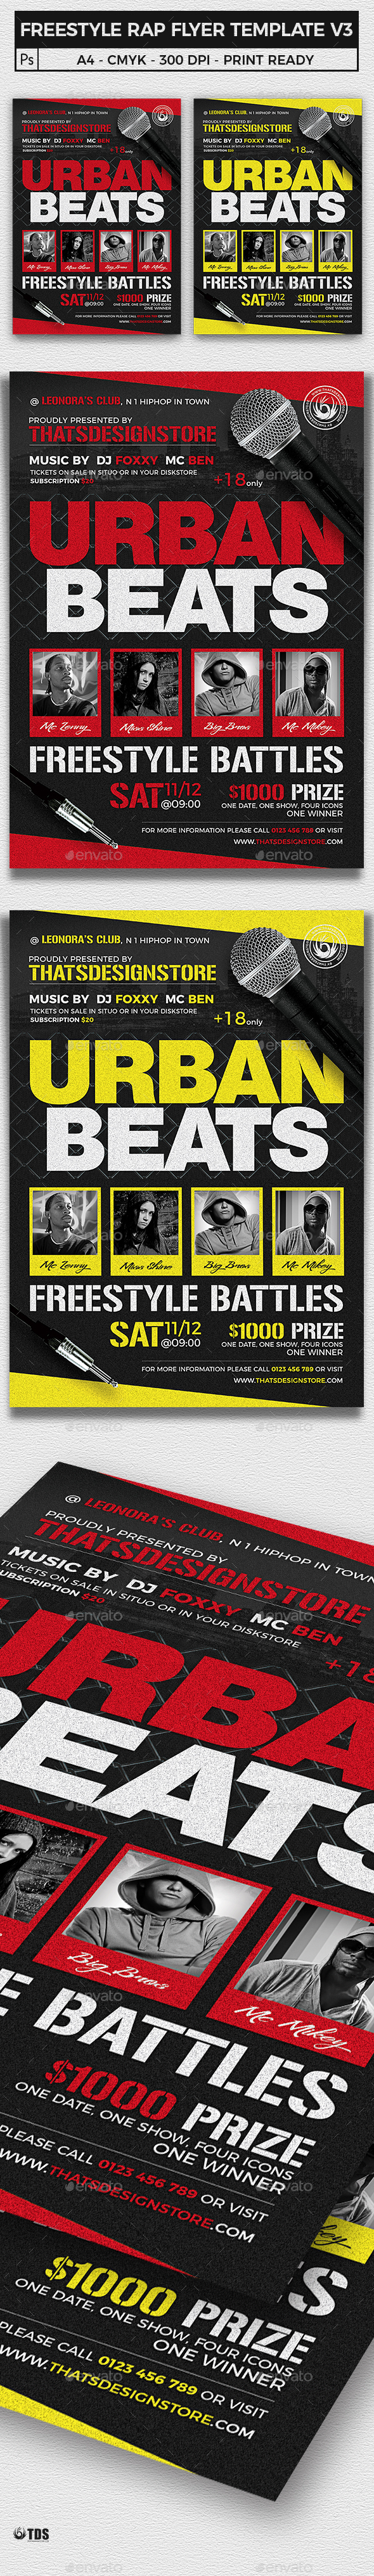 Freestyle Rap Battle Flyer Template V3 - Clubs & Parties Events